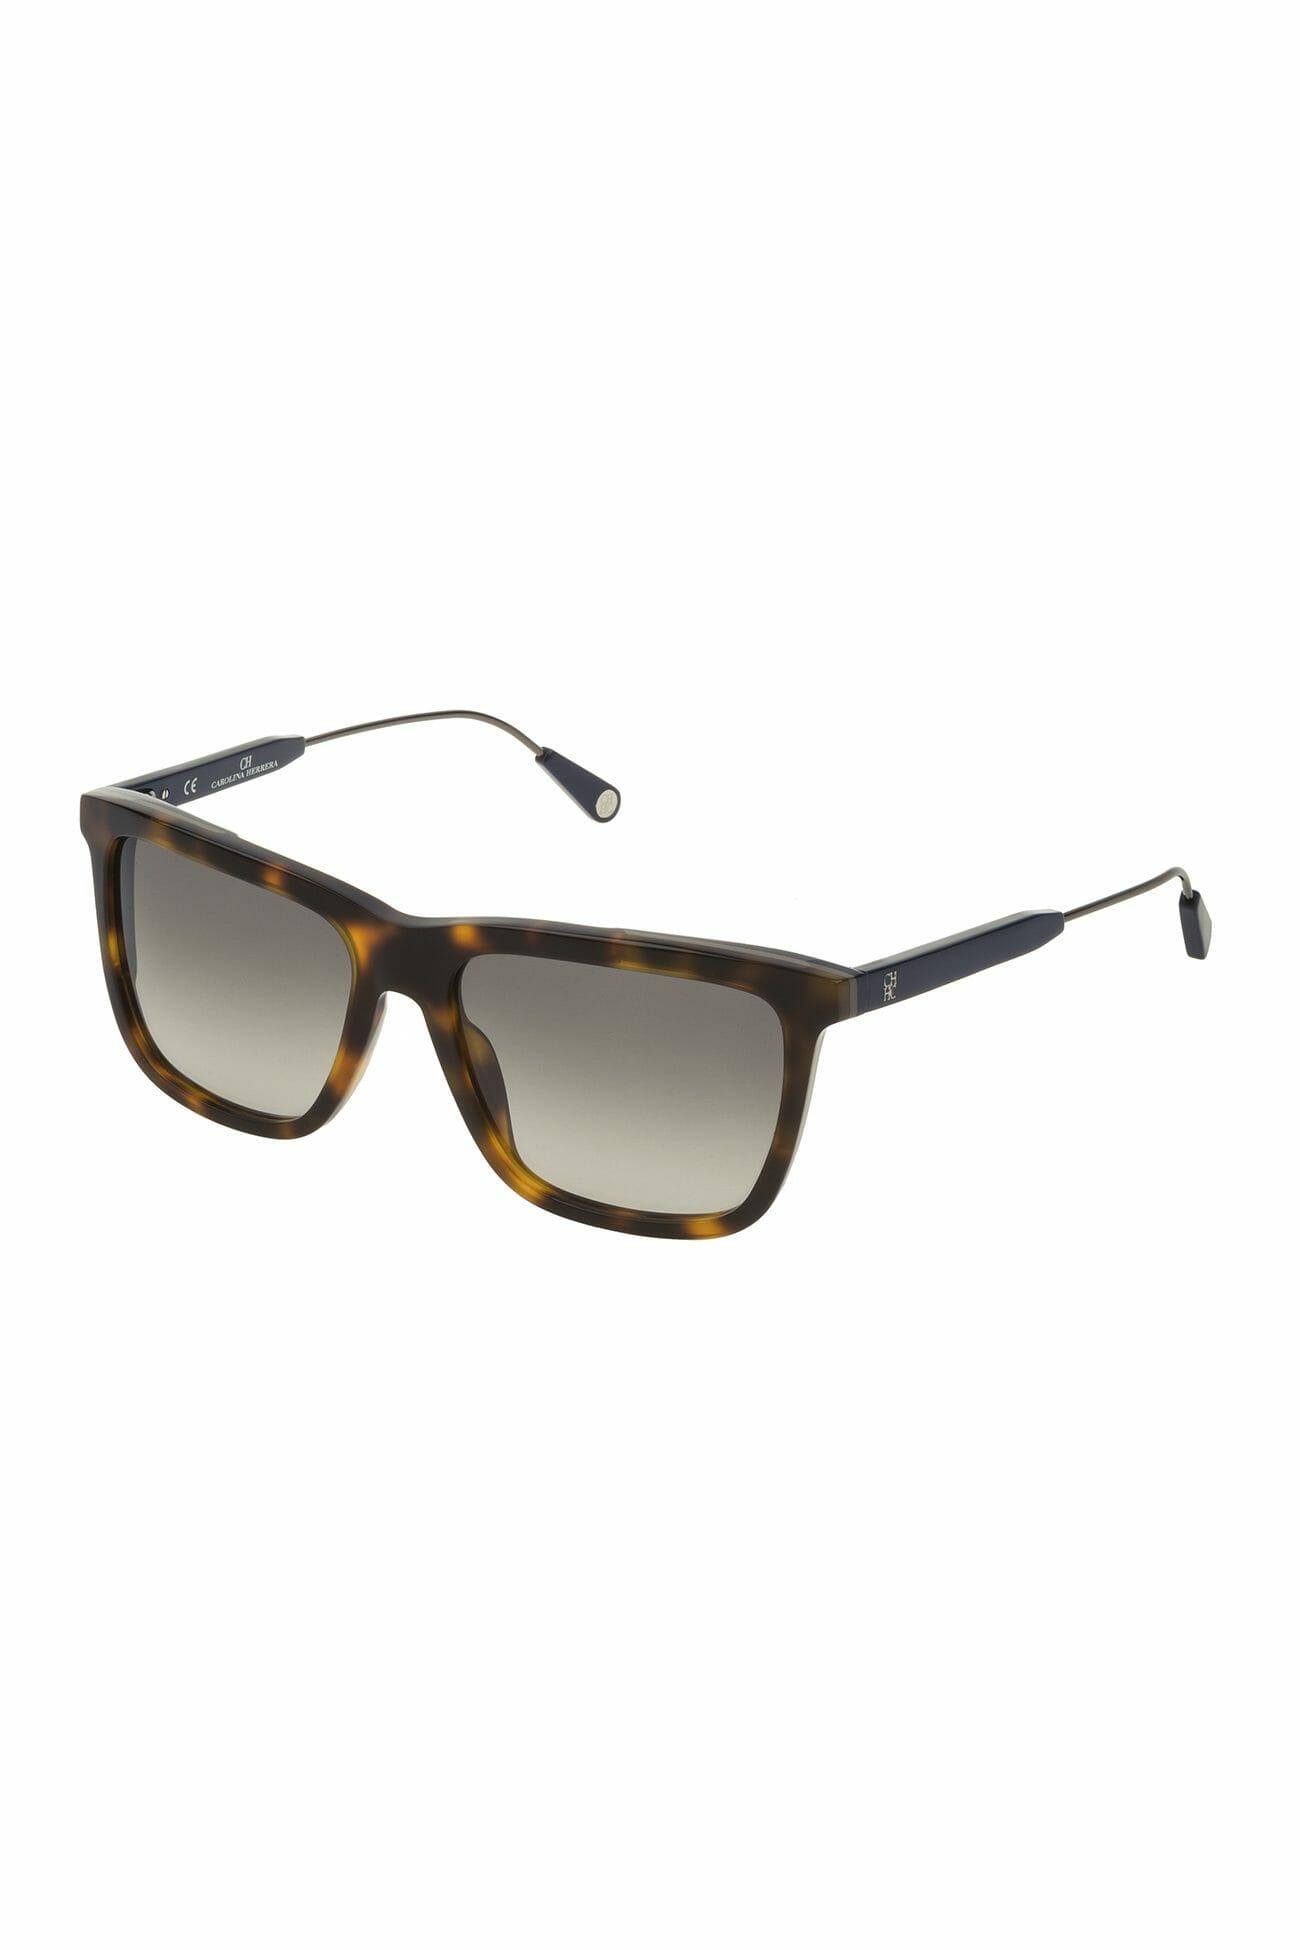 CH-Carolina-Herrera-Eyewear-Sunglasses-Men